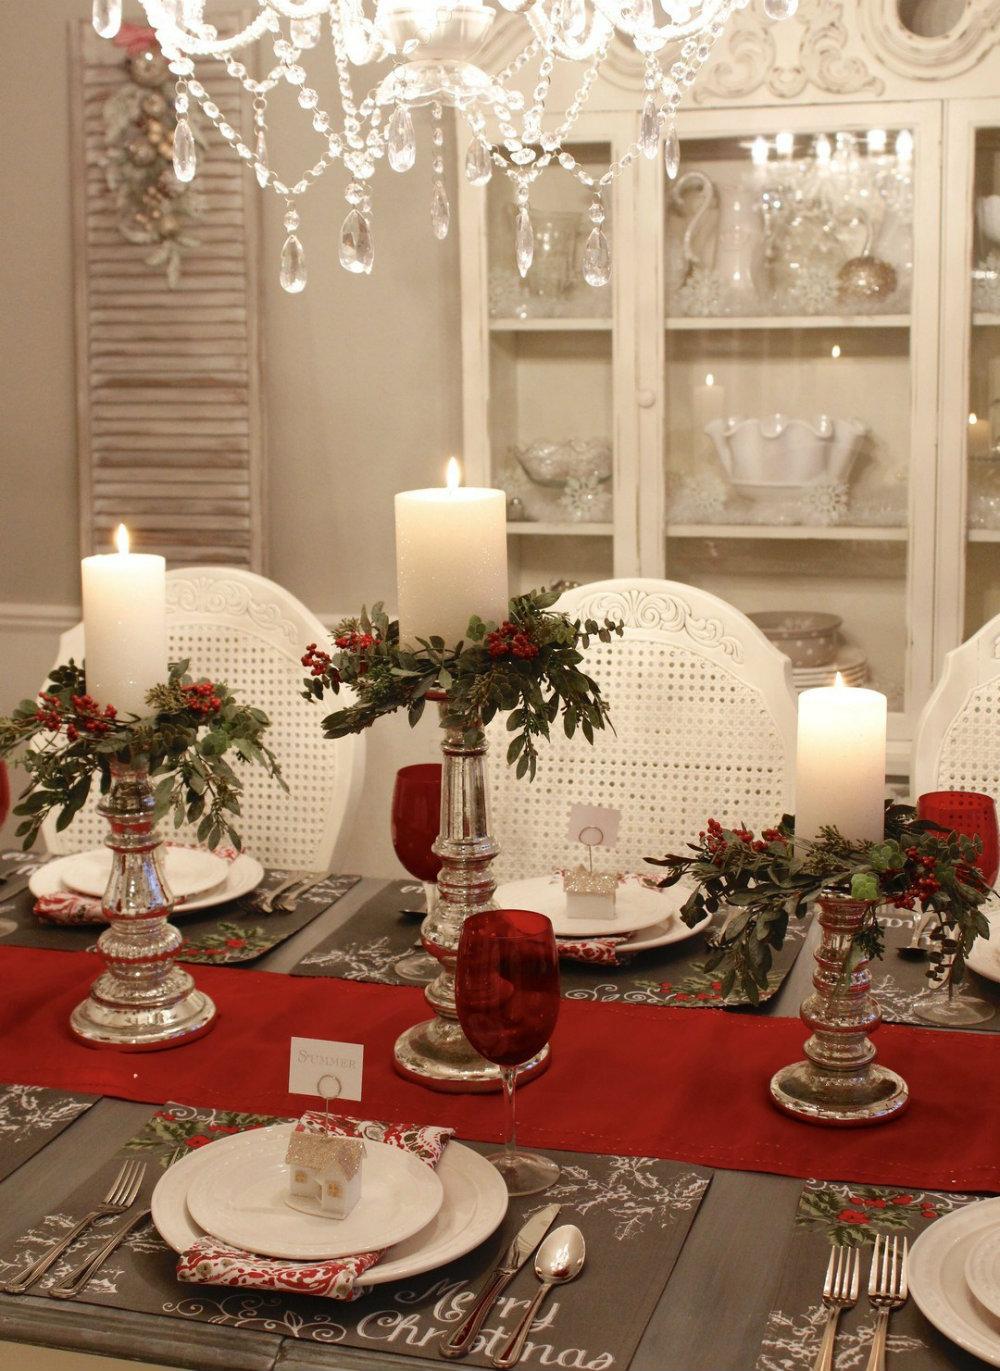 5 Classic And Timeless Christmas Decor Ideas